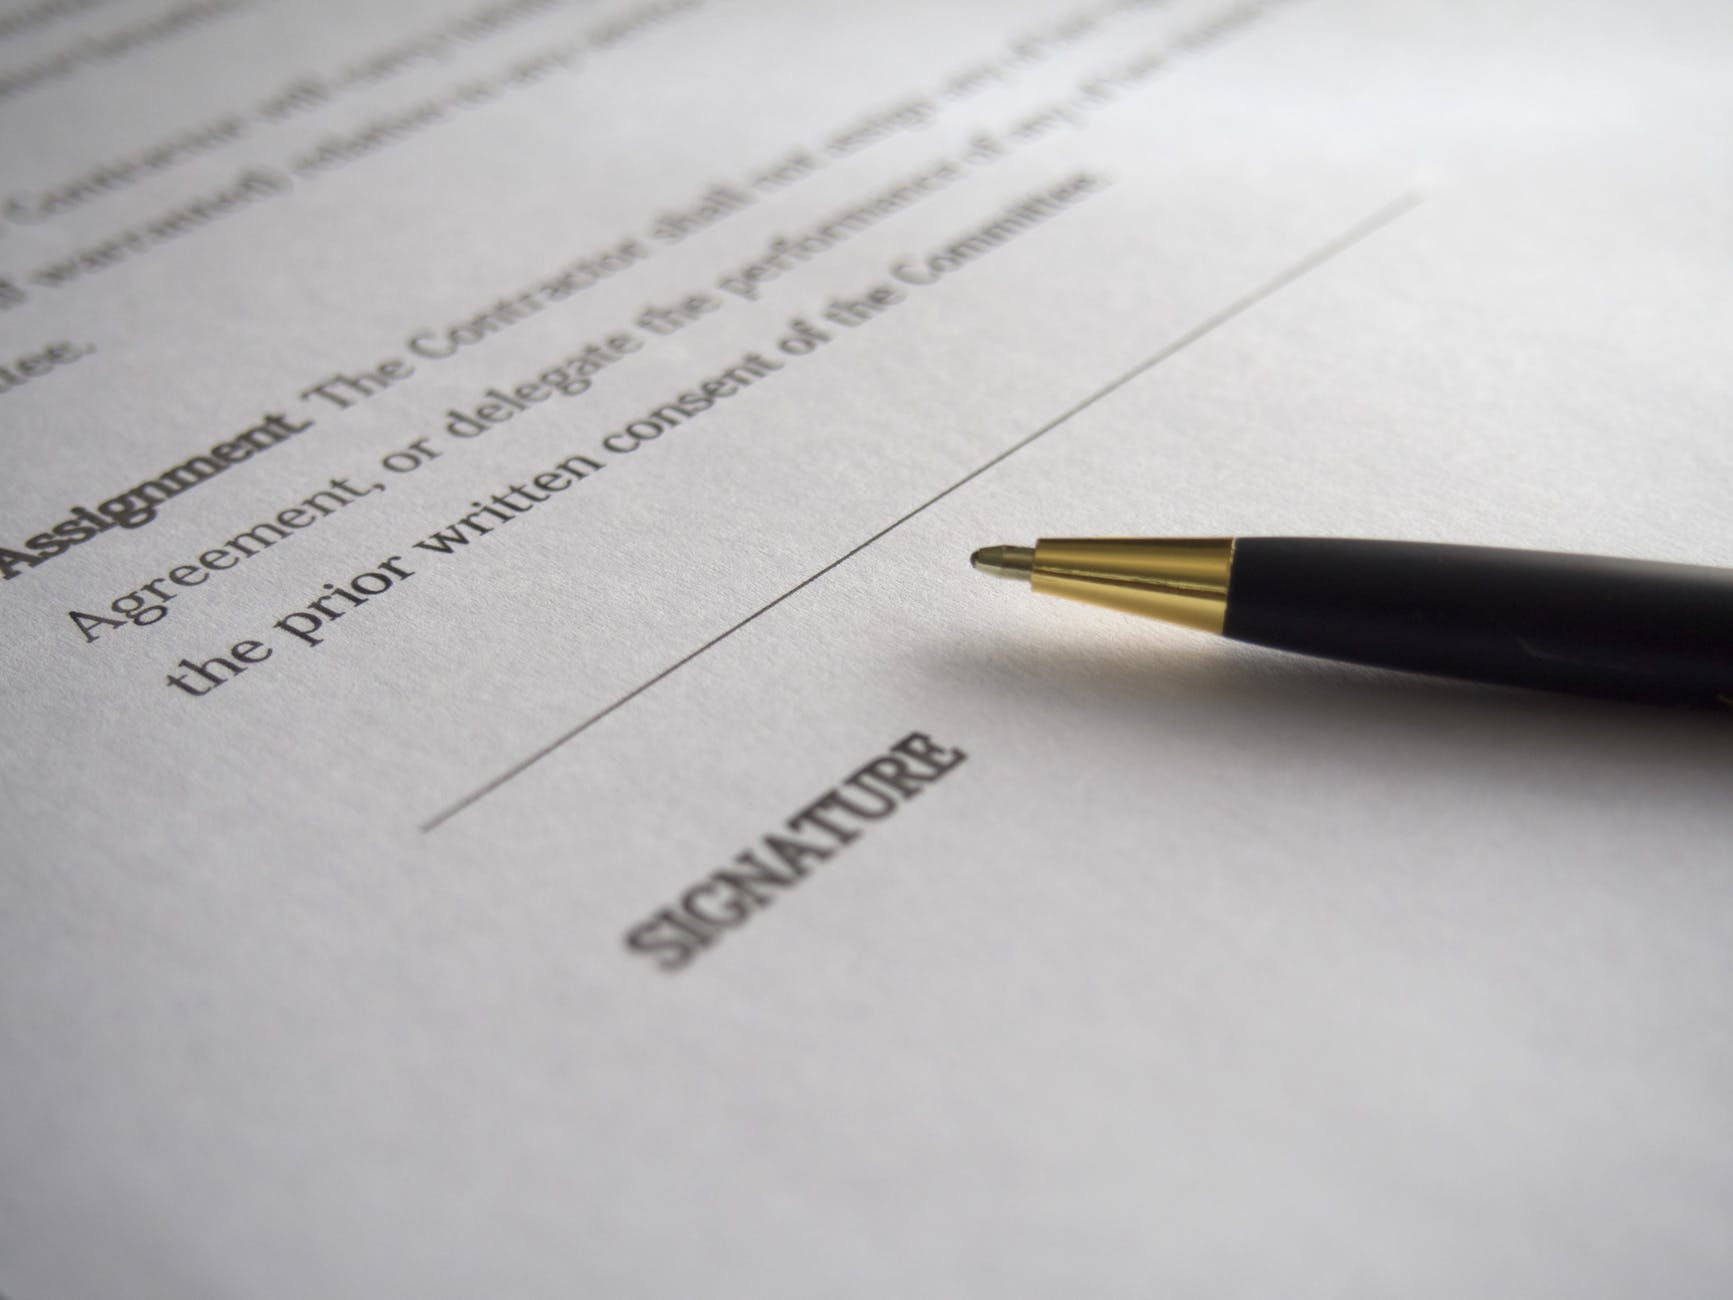 advice on restrictive covenants